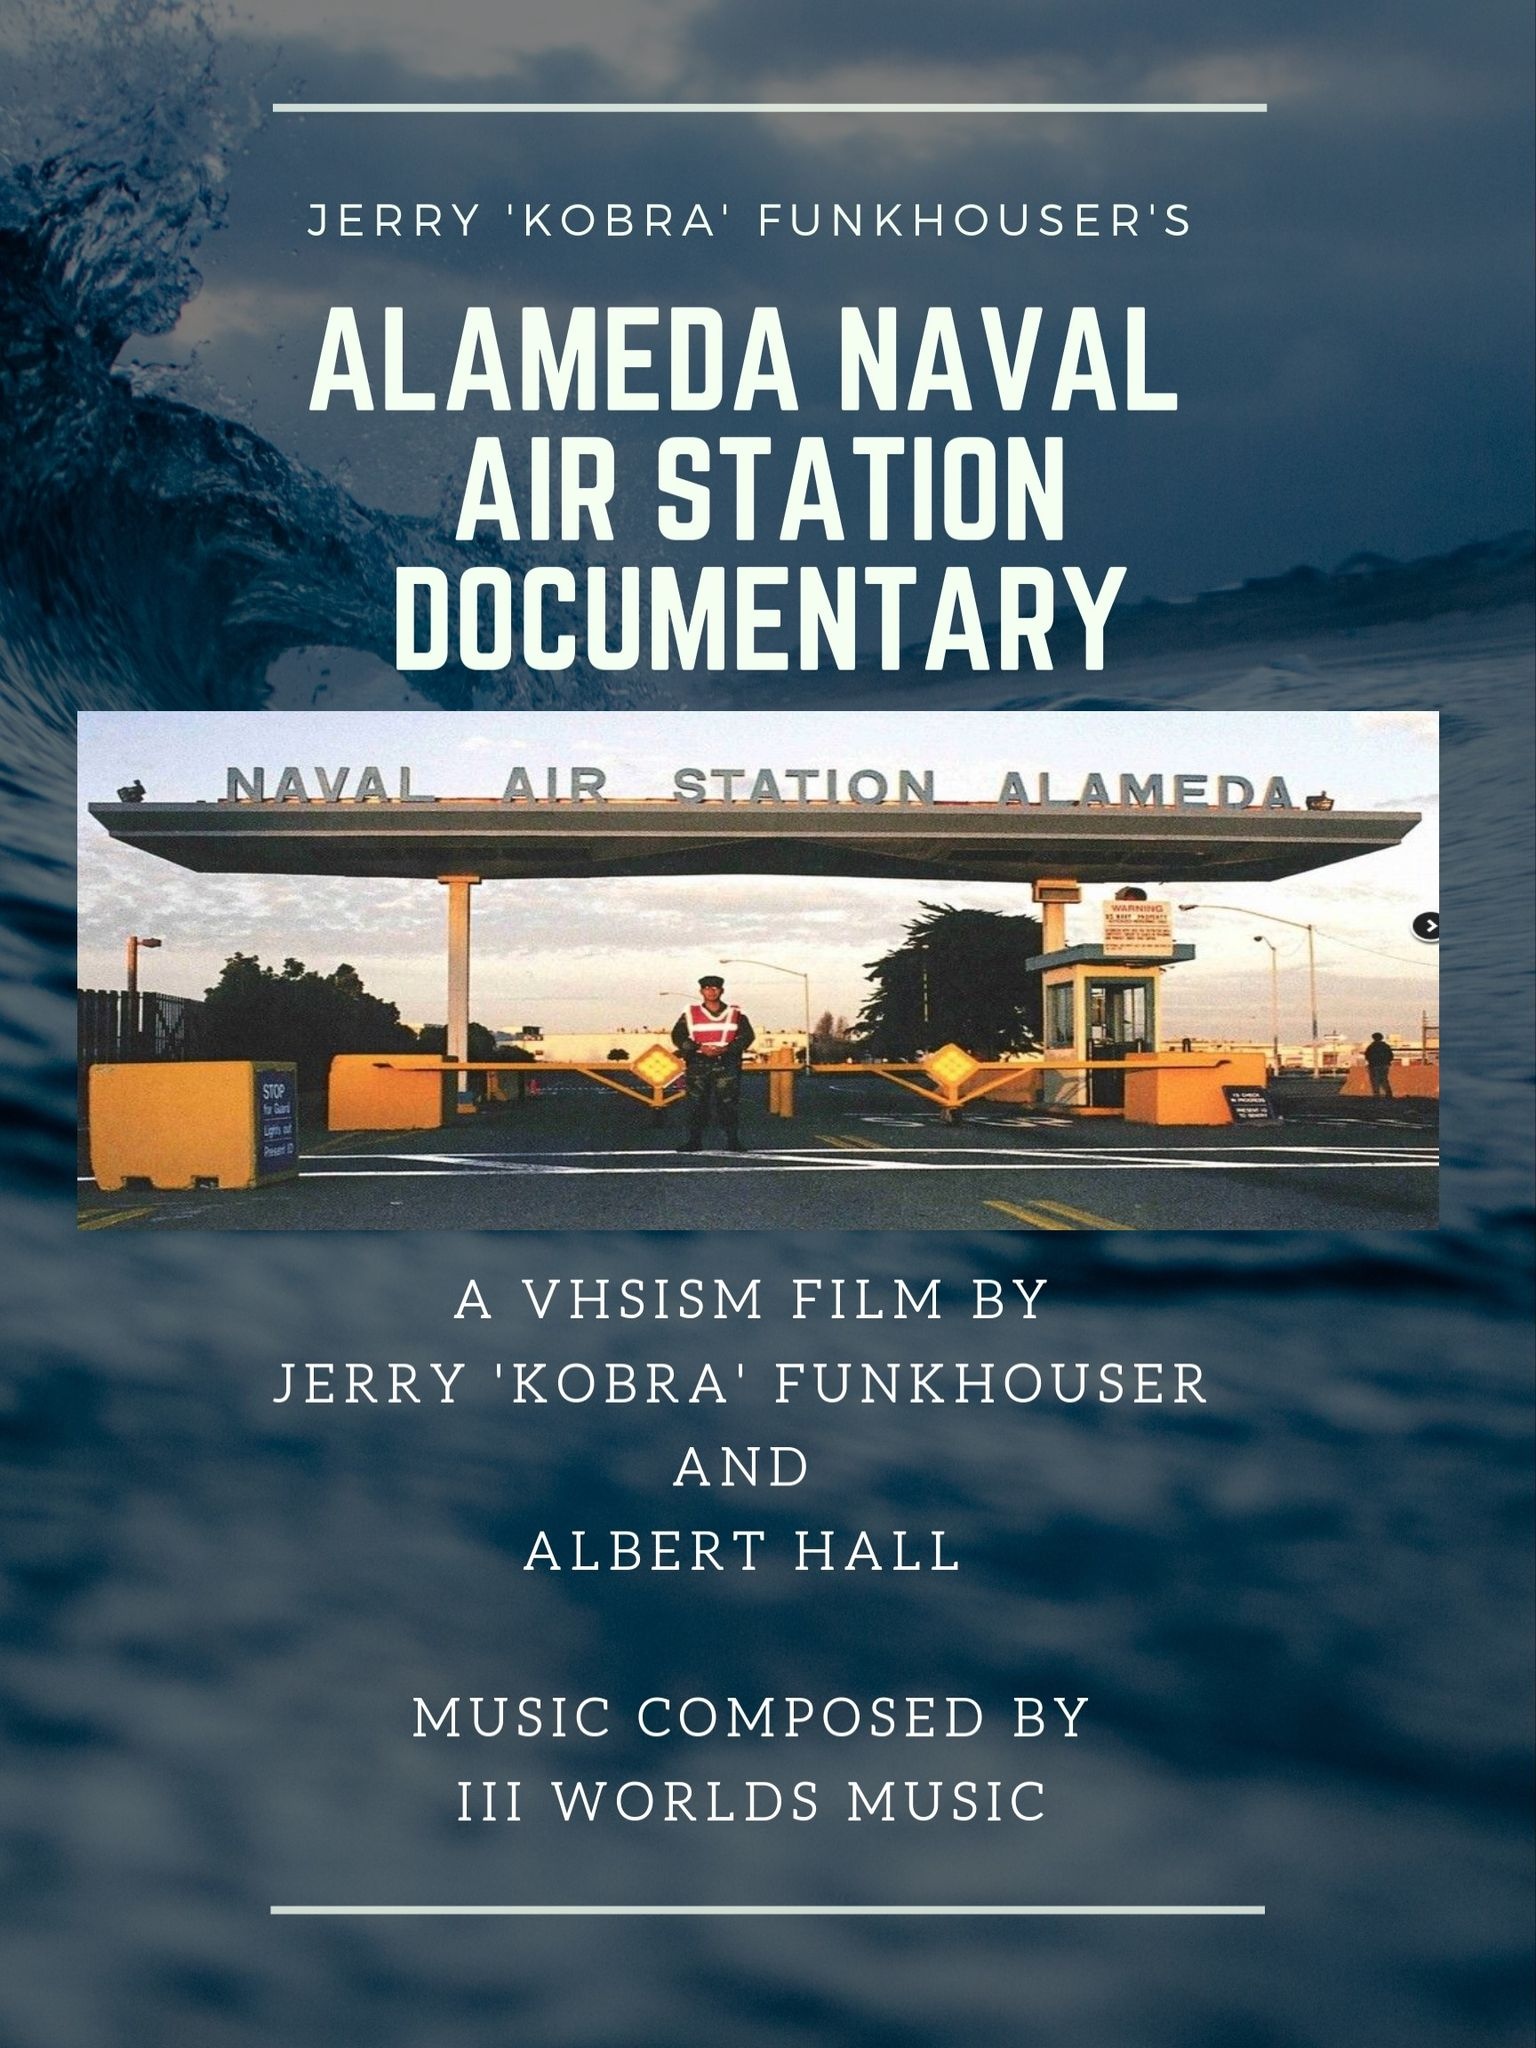 Alameda Naval Air Station Documentary